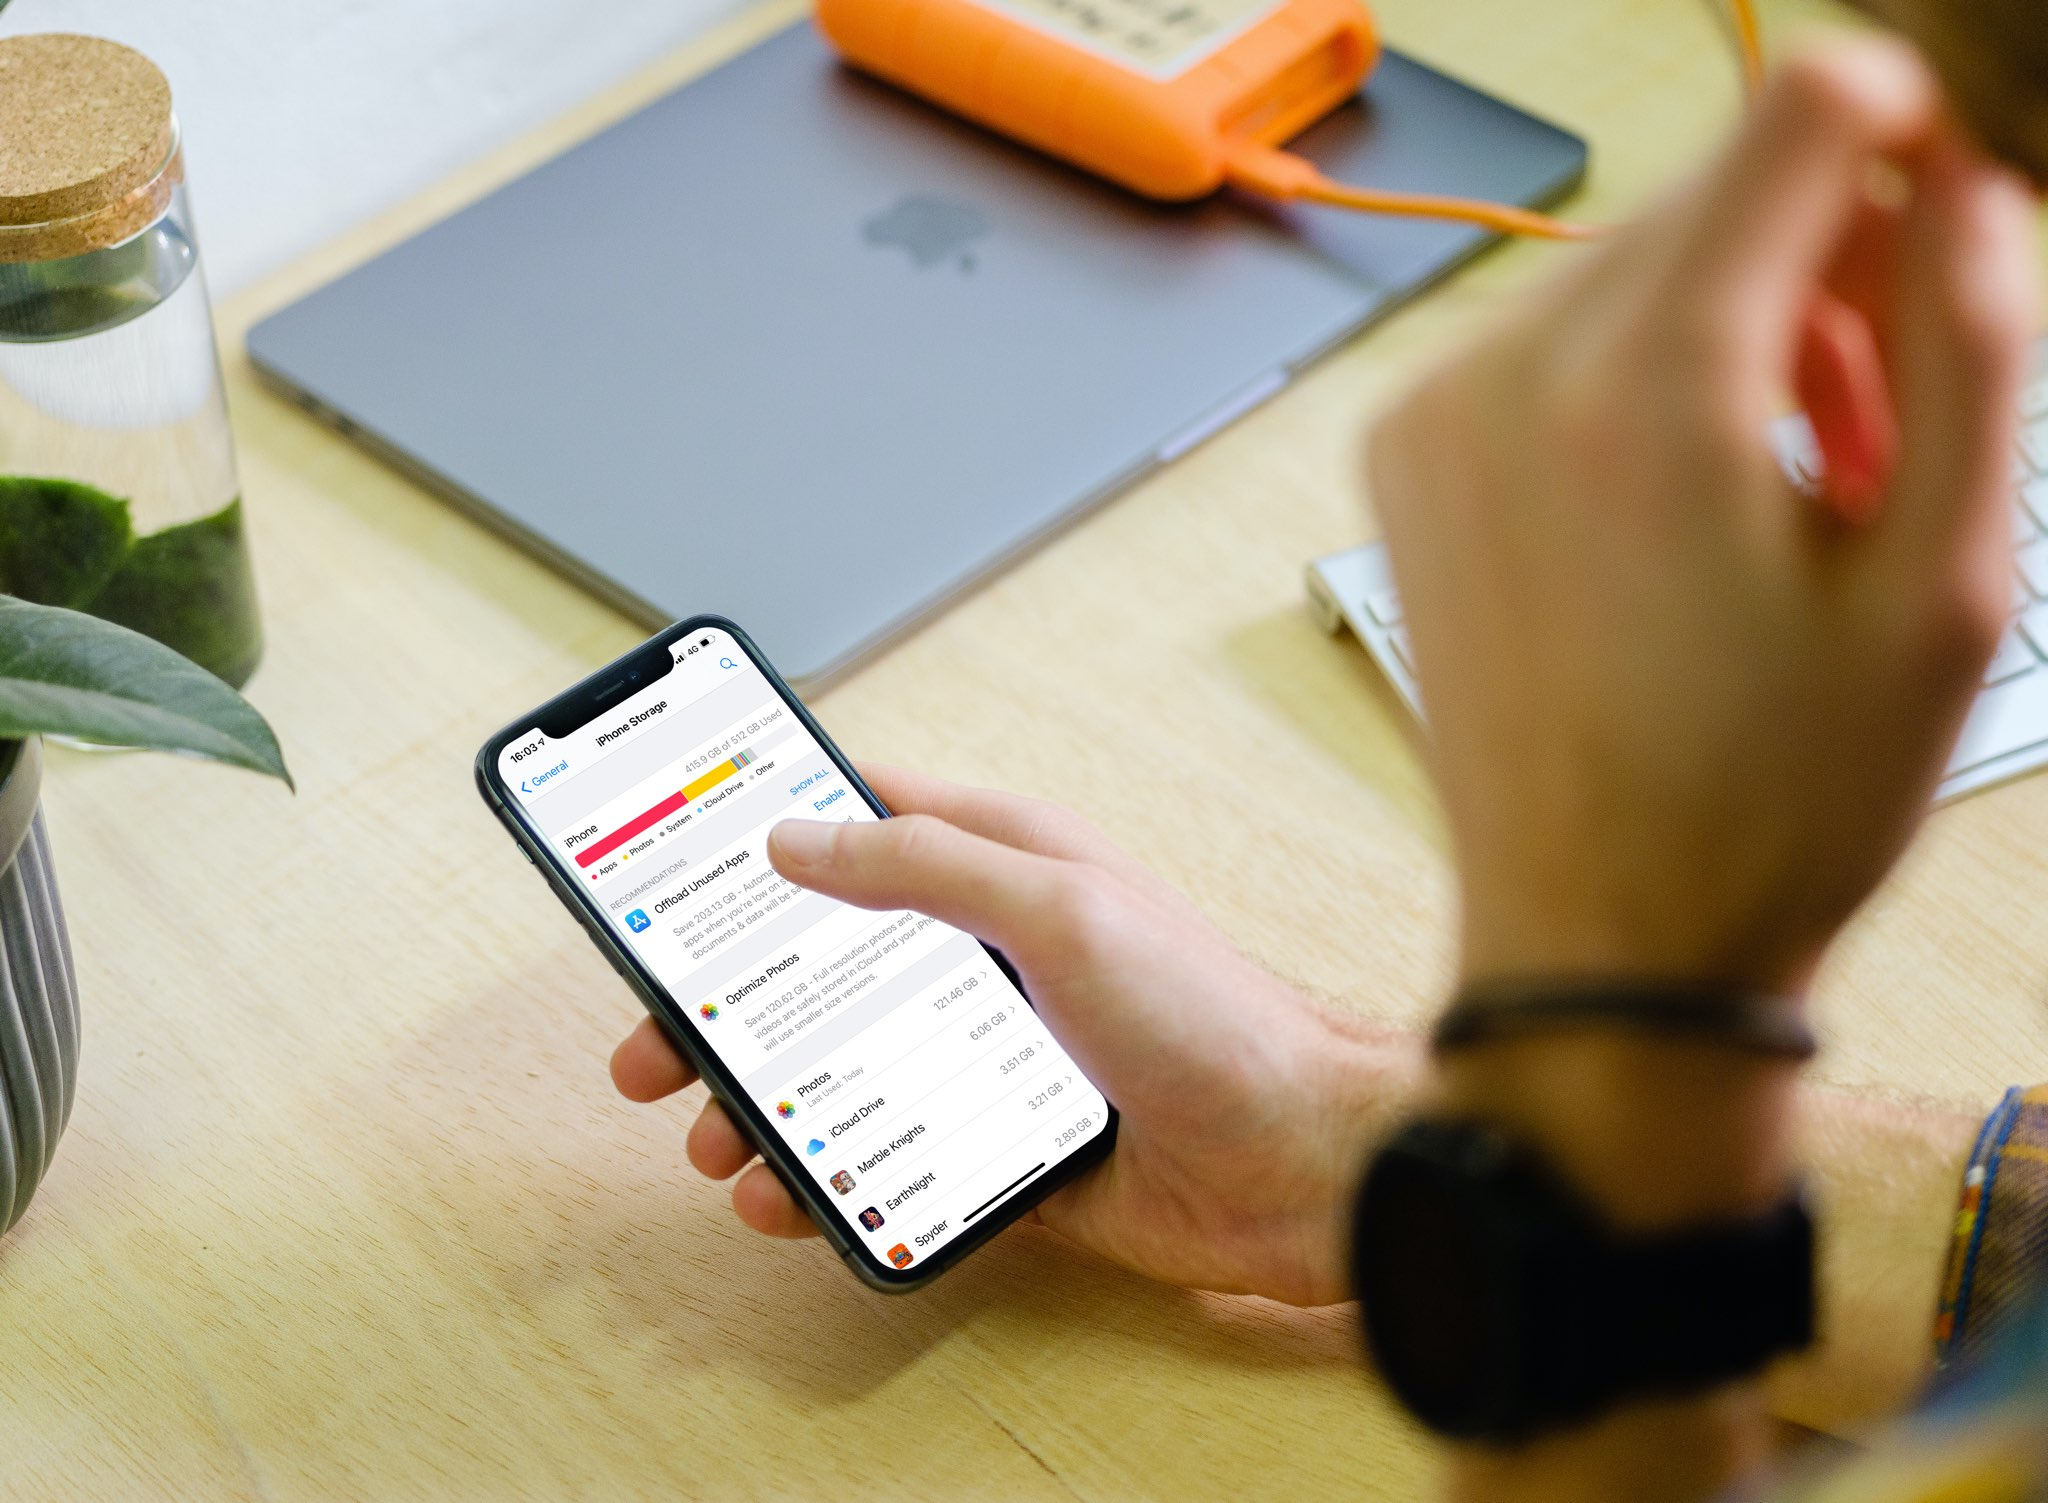 iPhone storage search - hero image